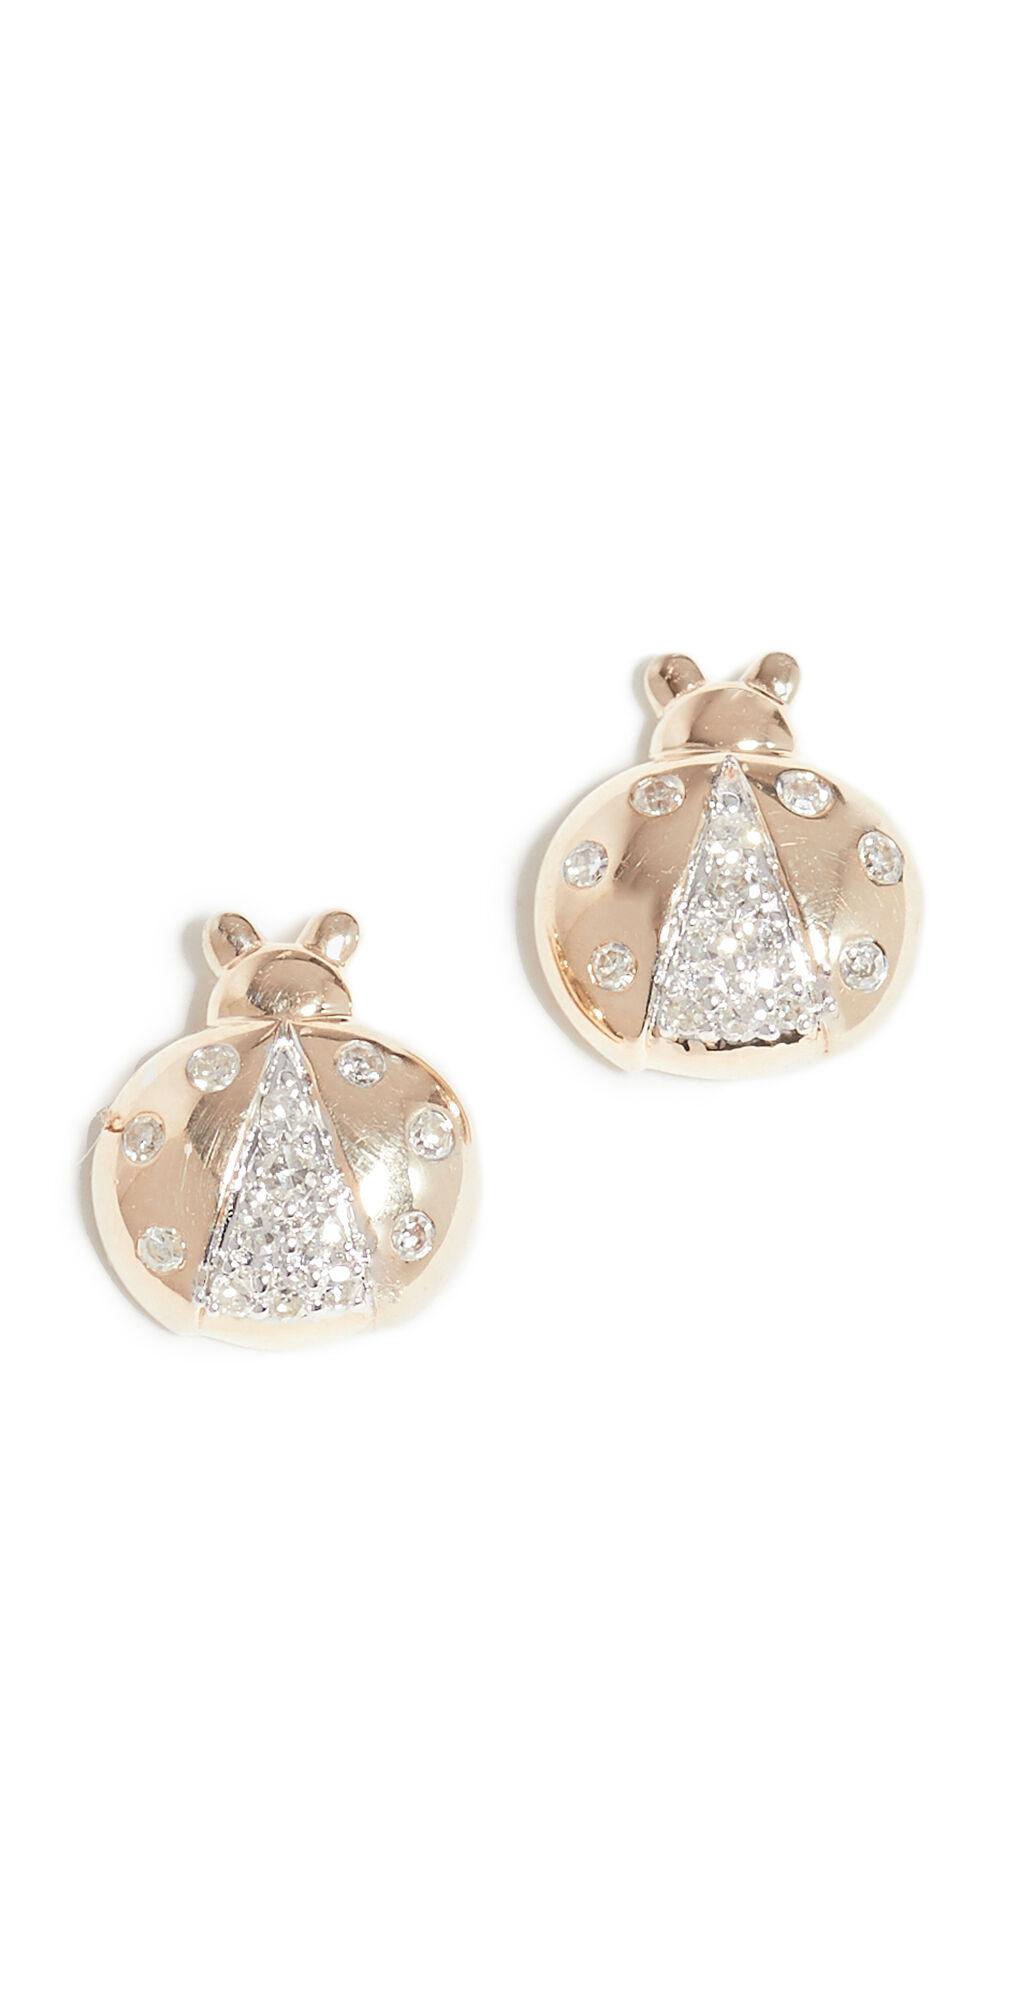 Adina Reyter 14k Garden Pavé Ladybug Post Earrings  - Yellow Gold - Size: One Size